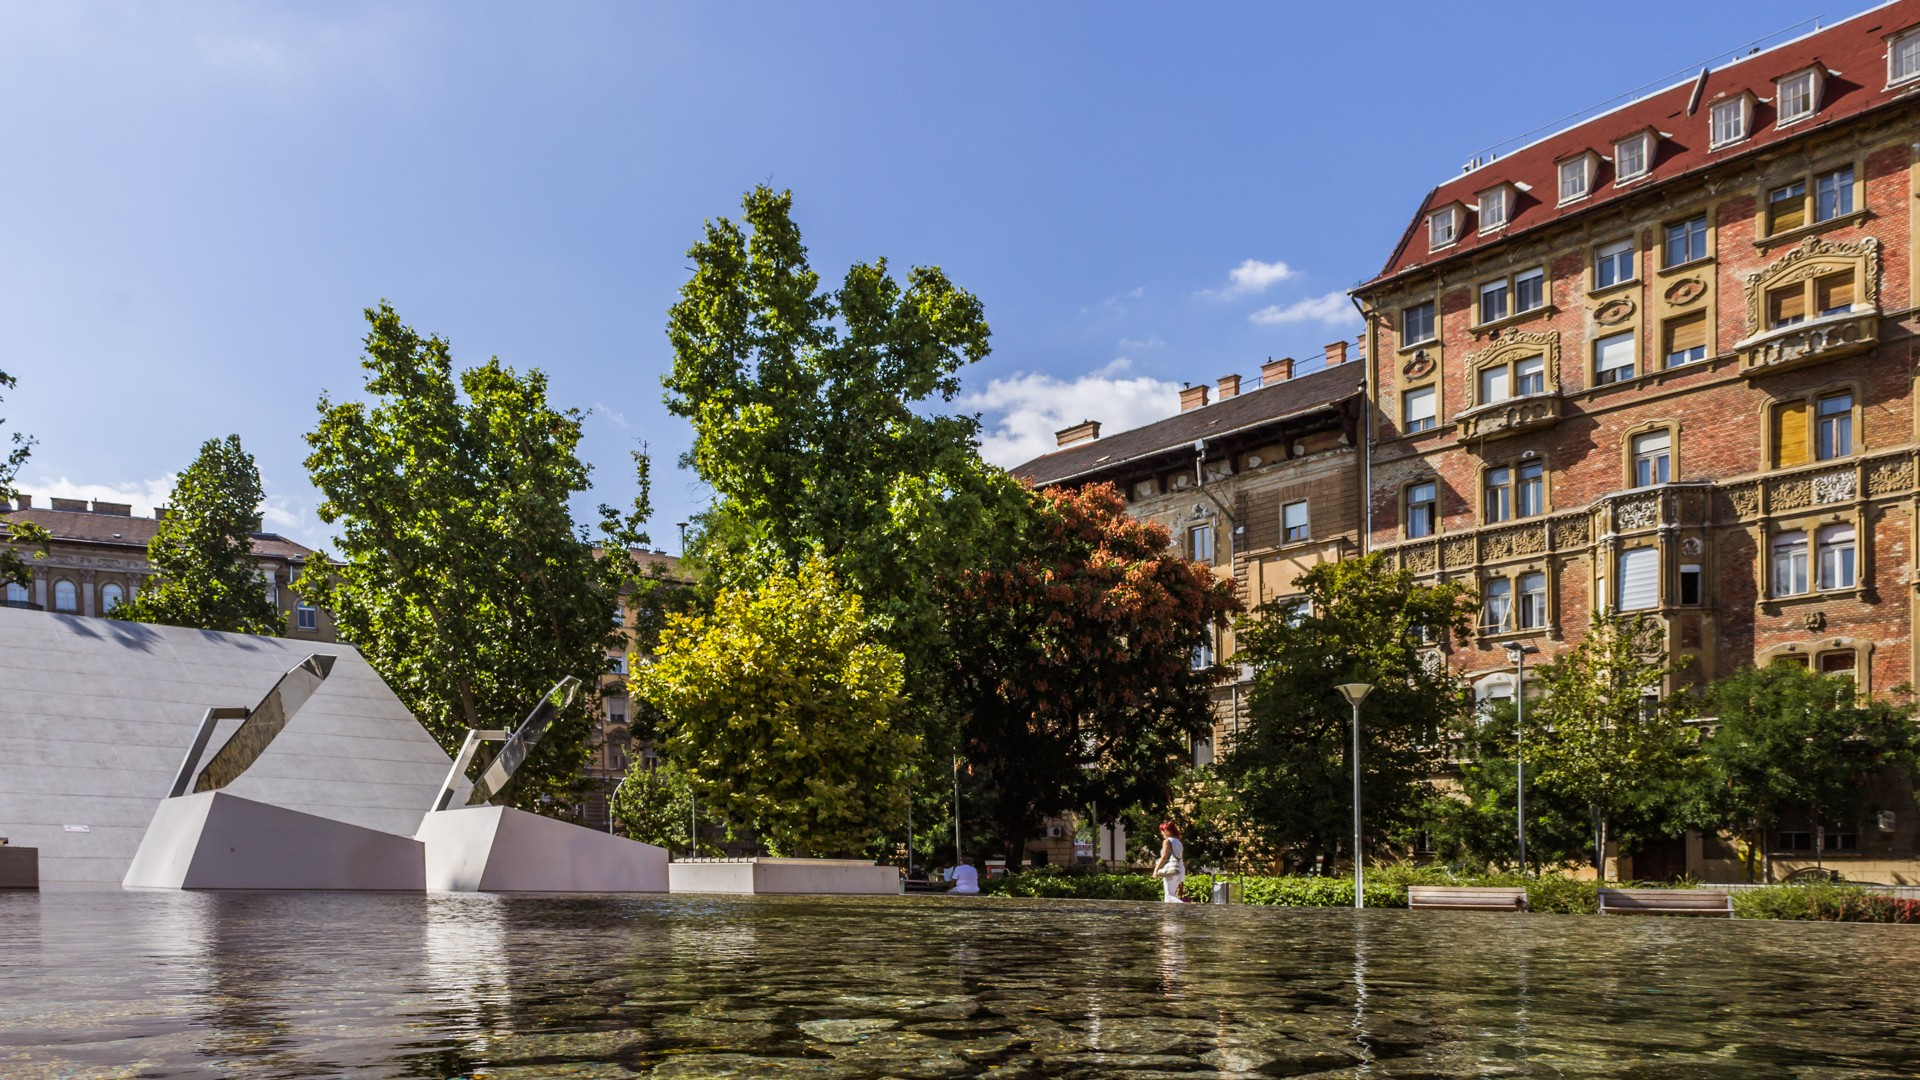 Rákóczi square